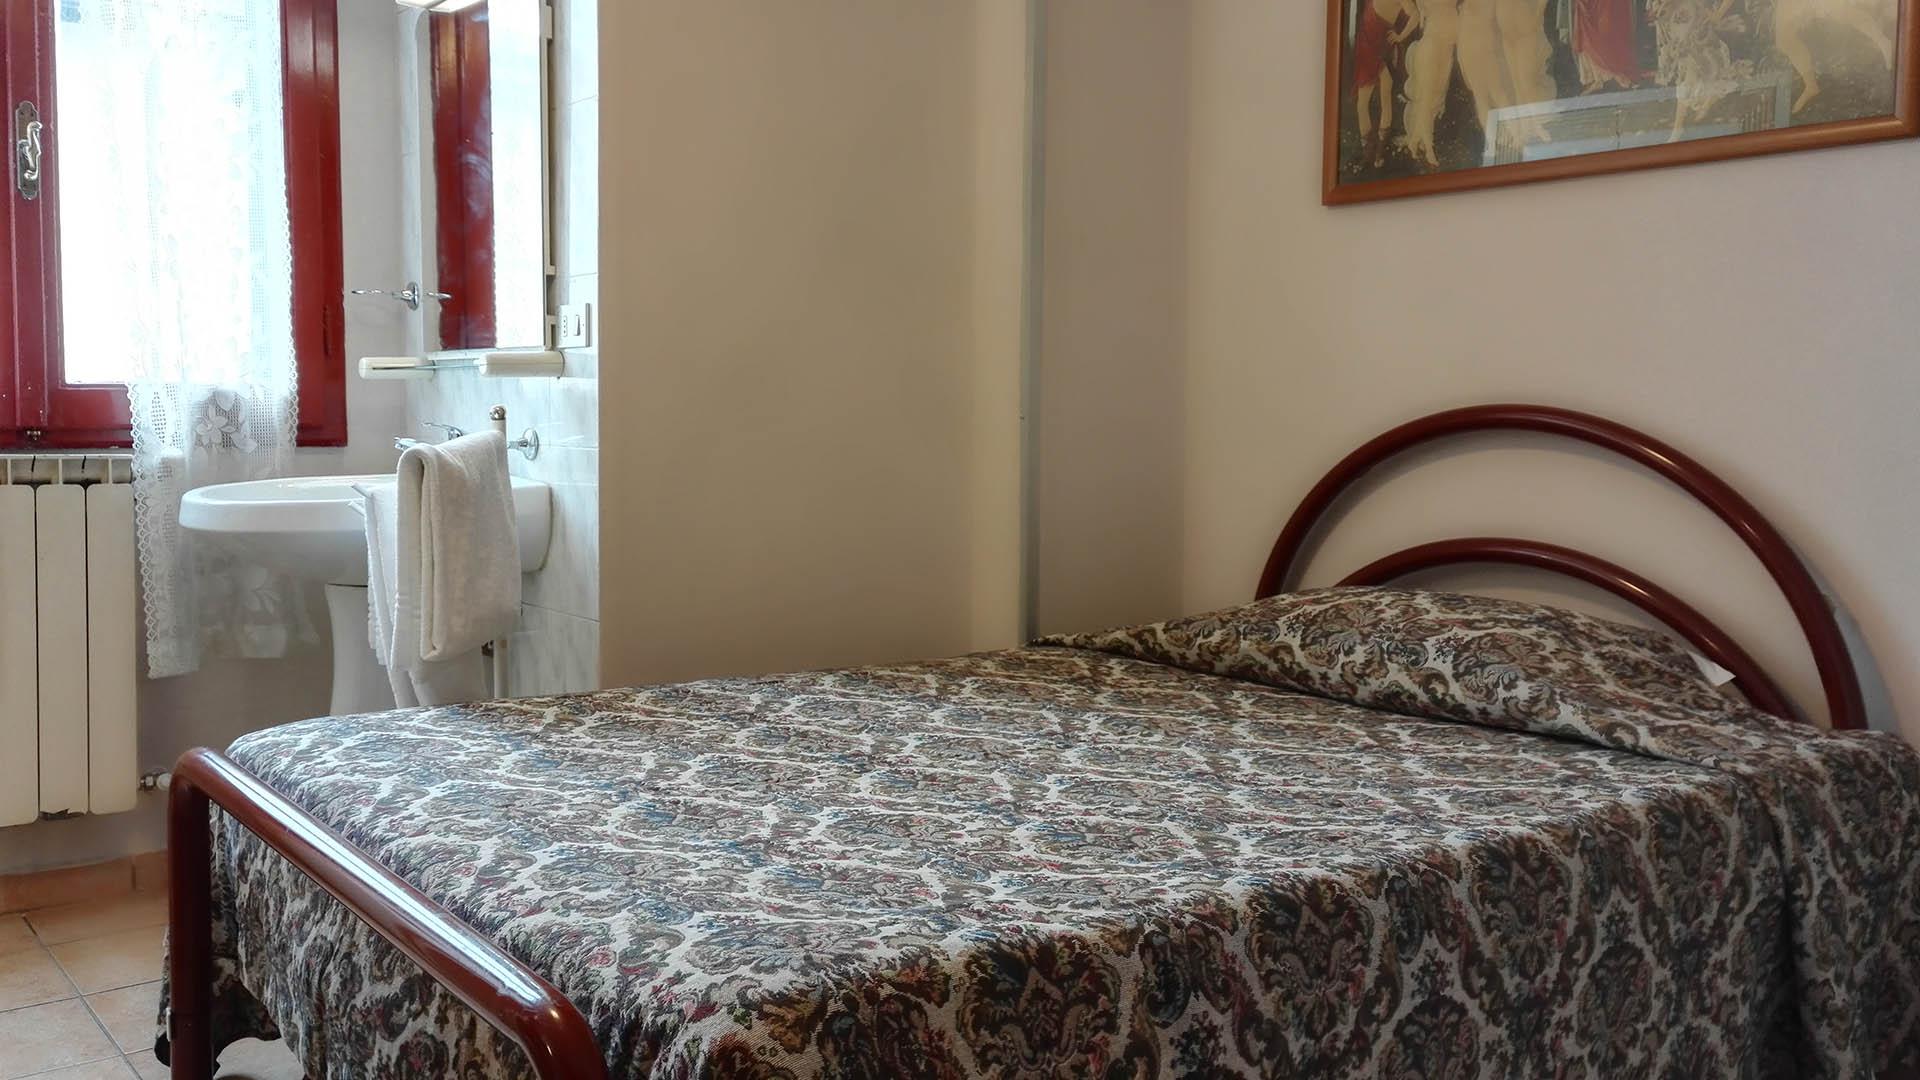 Bagno In Comune Hotel : Hotel bavaria firenze